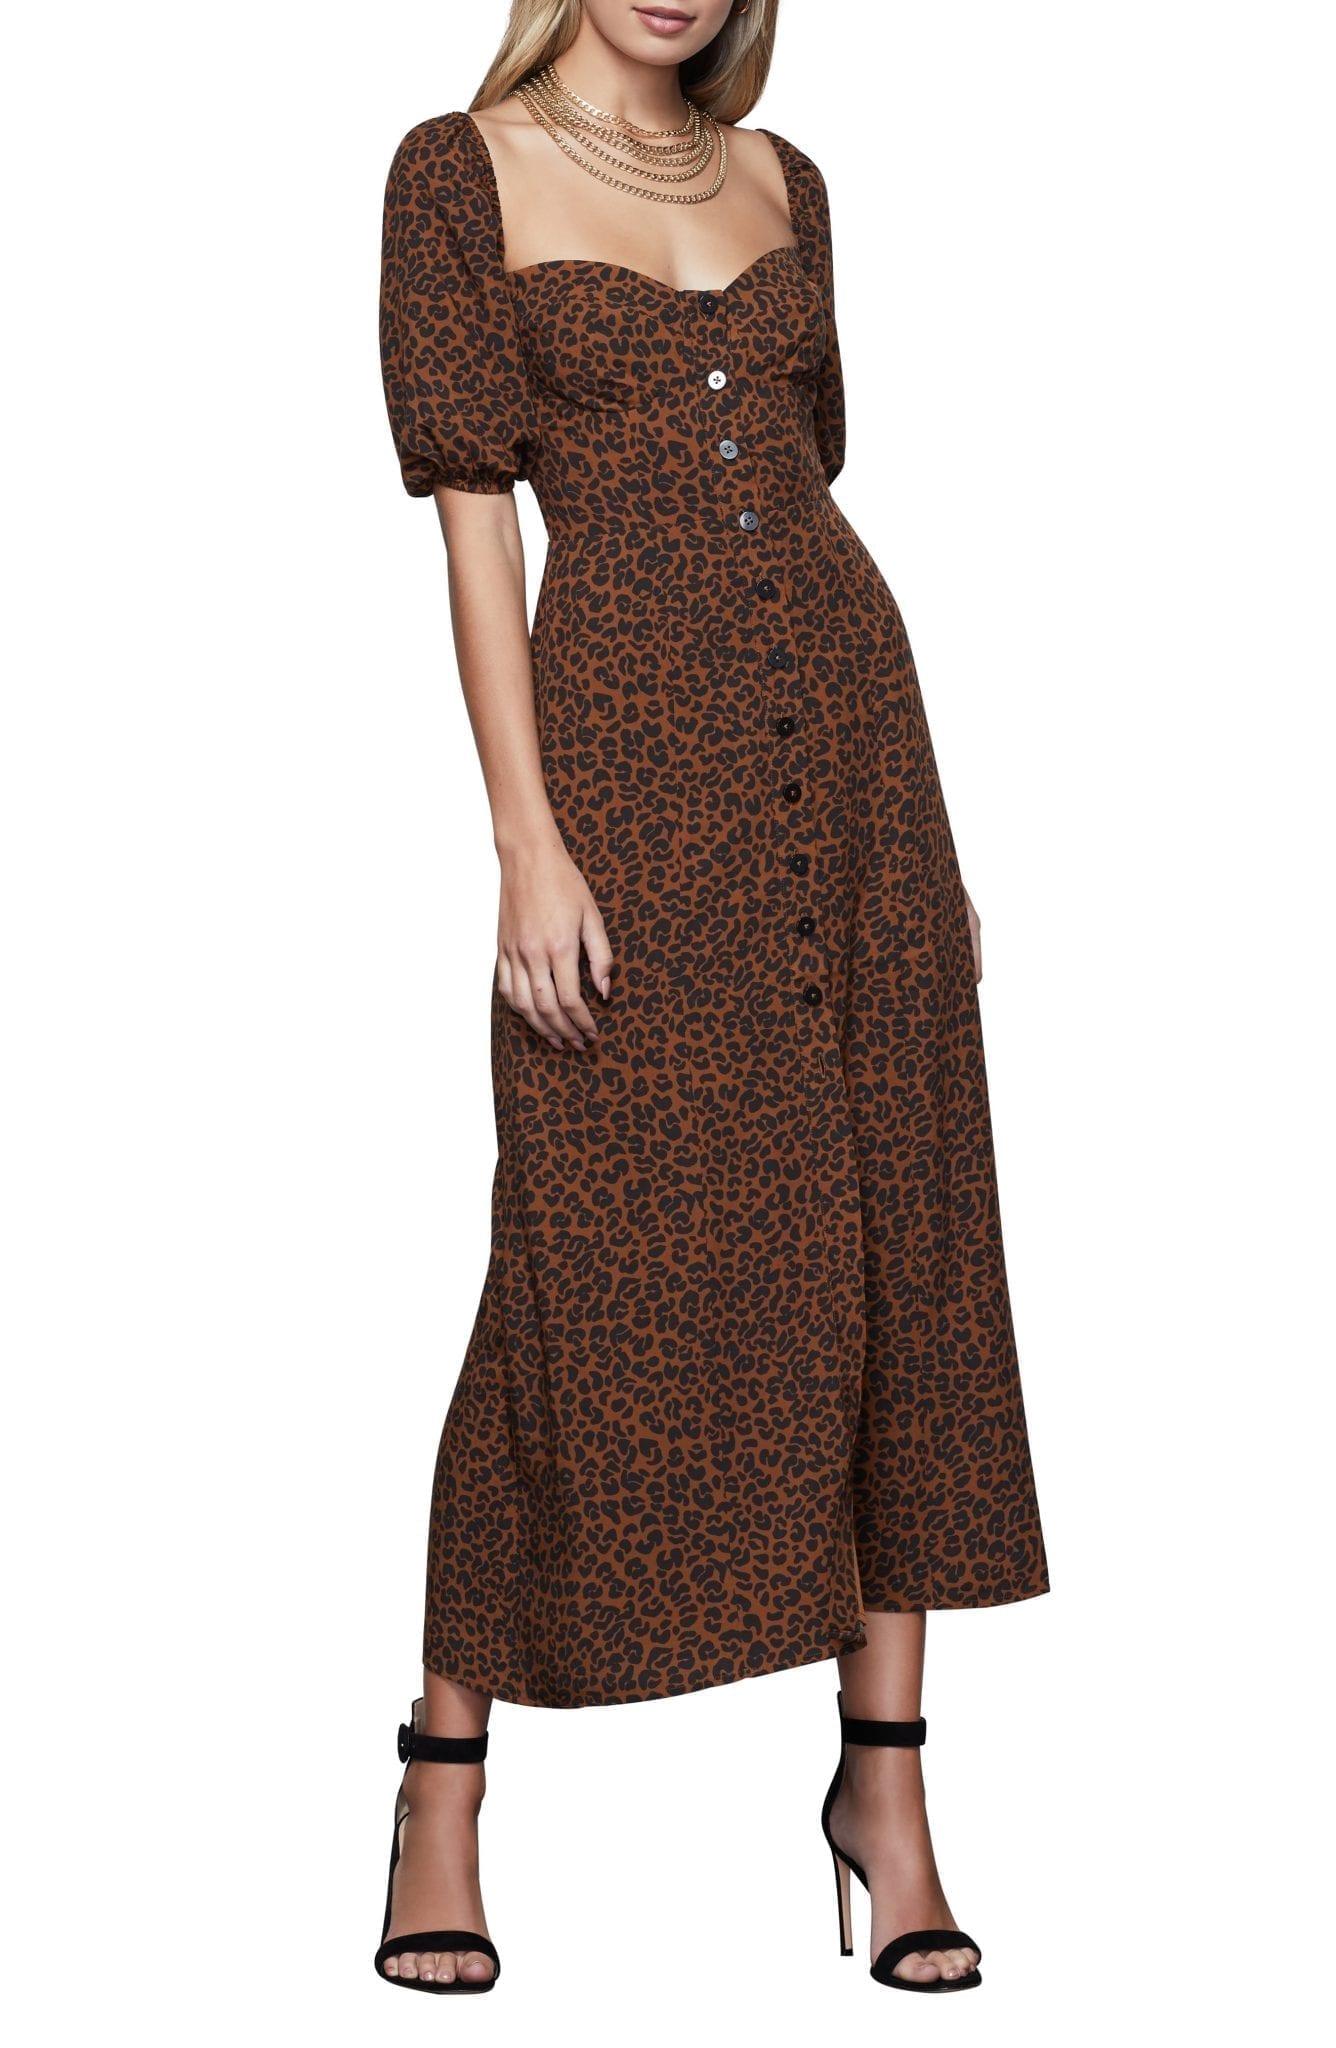 GOOD AMERICAN Corset Leopard Print Puff Sleeve Maxi Dress